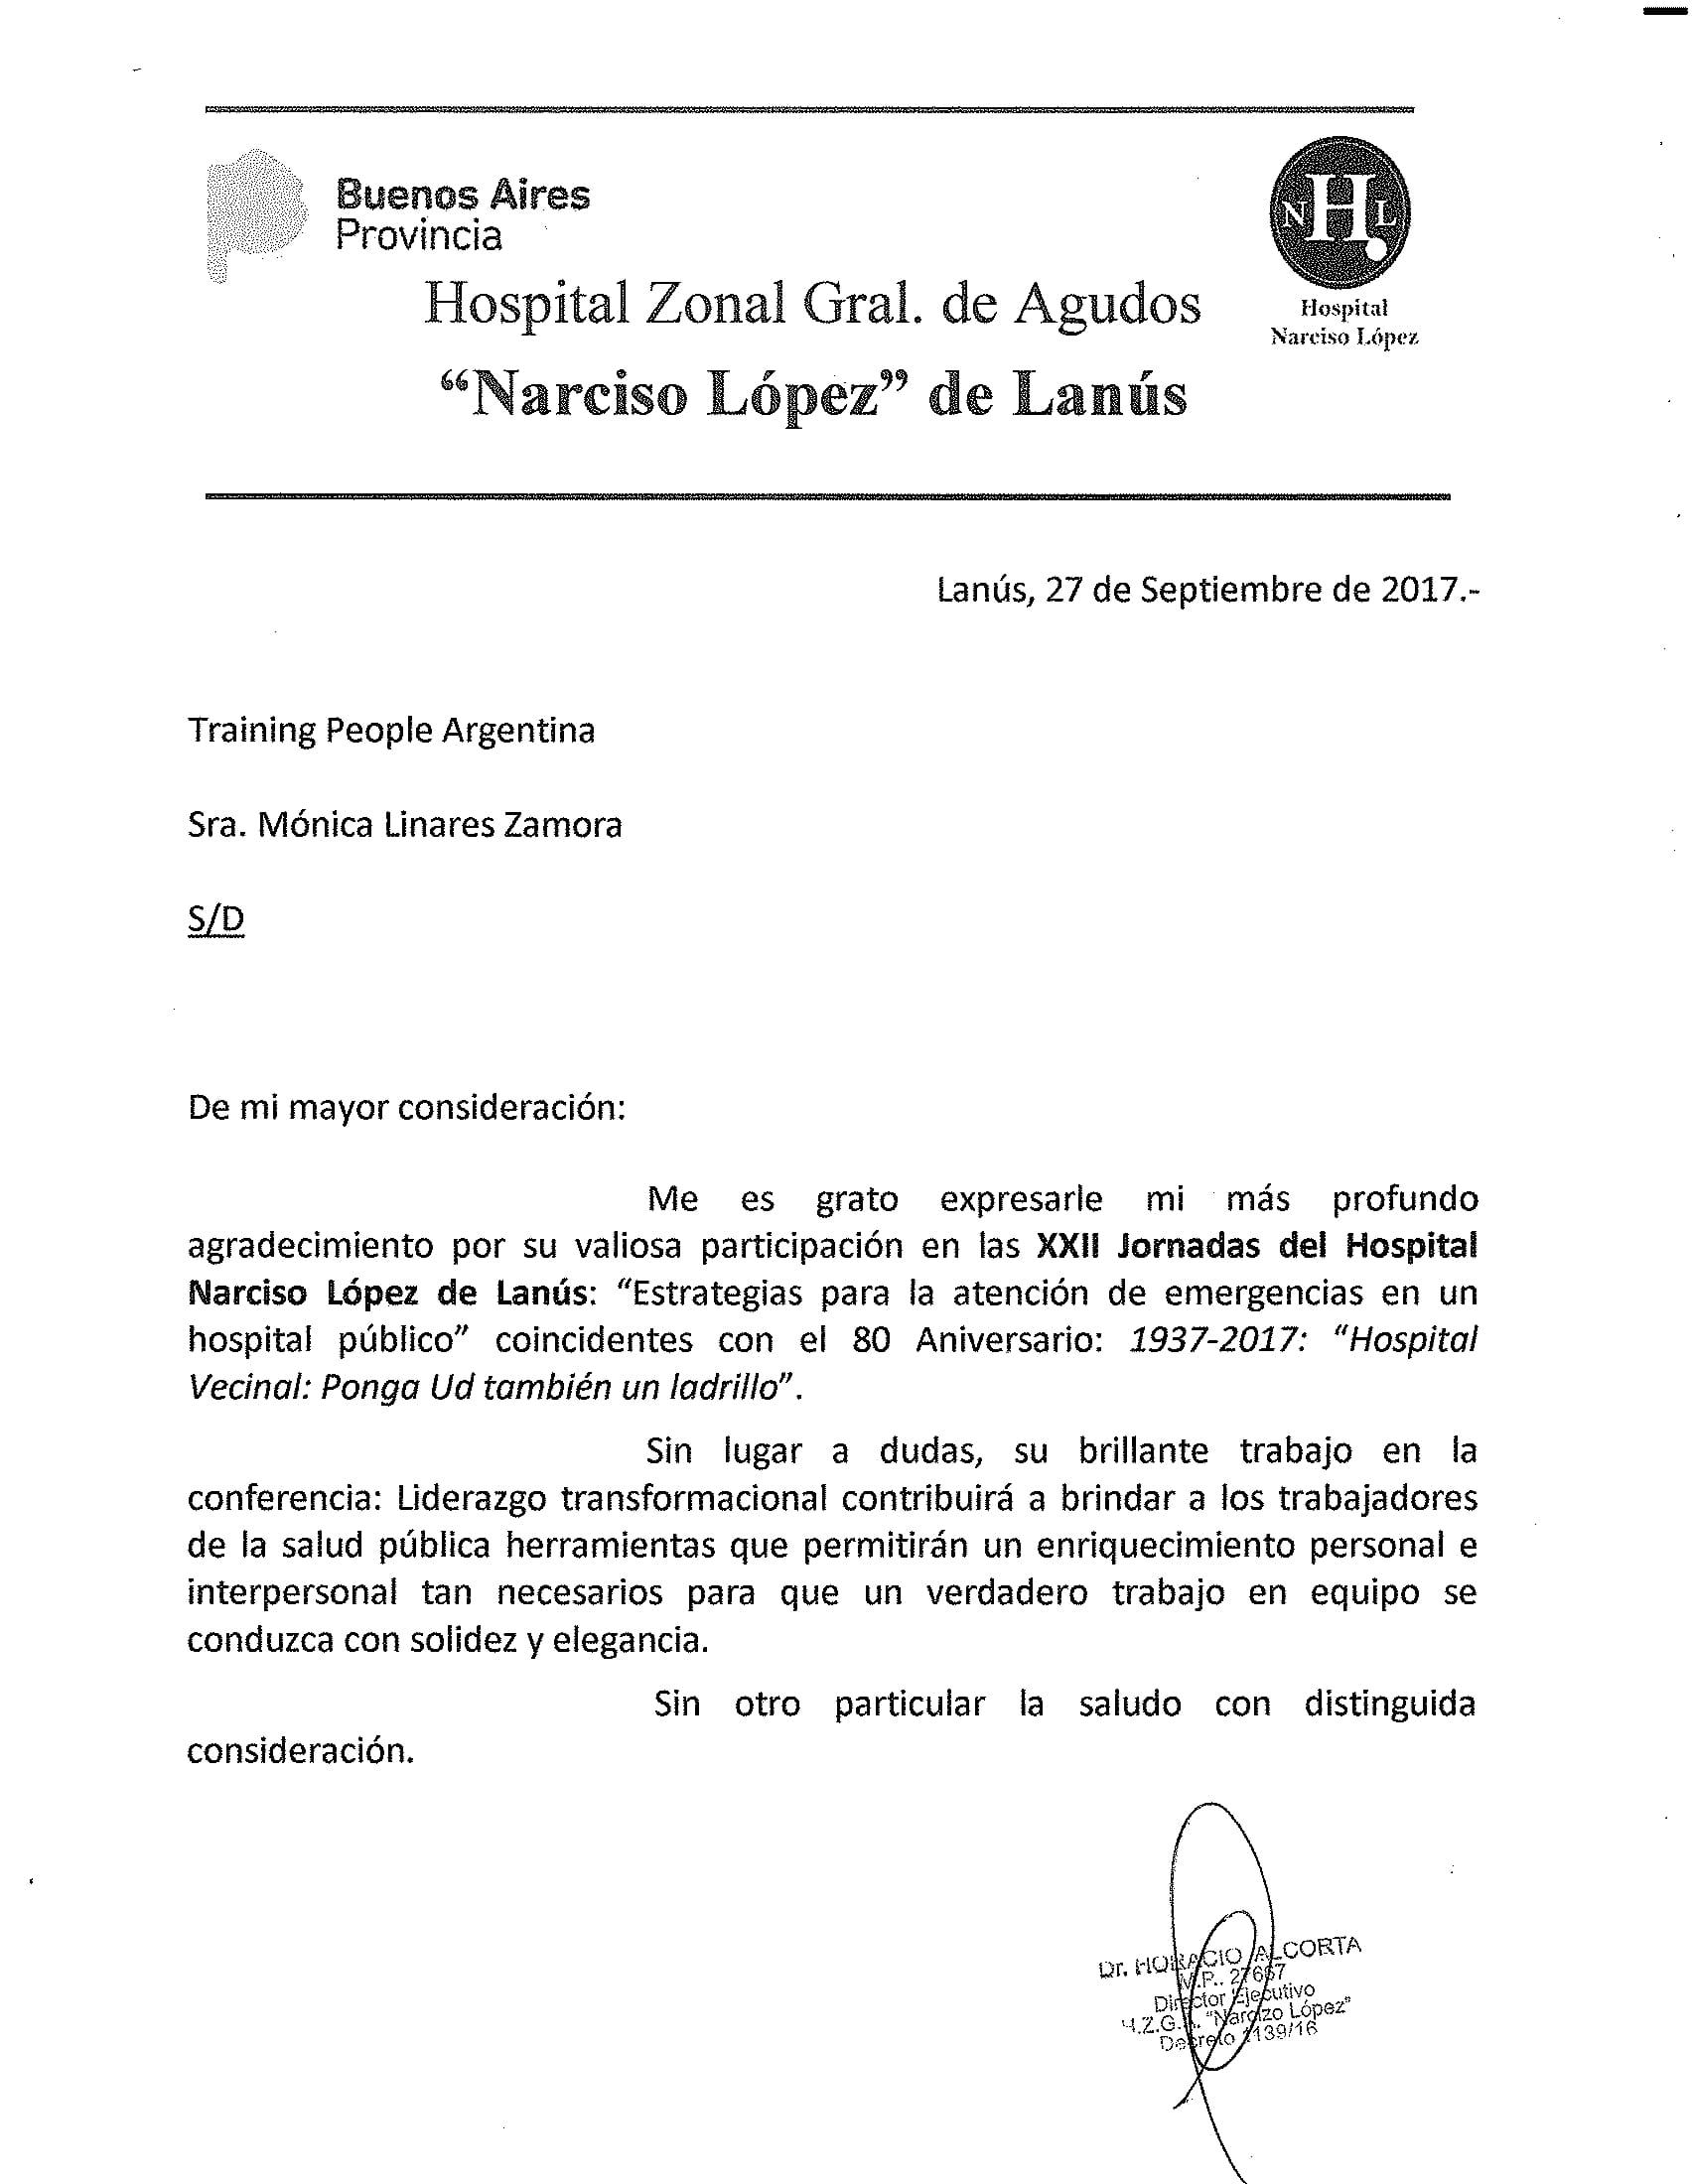 AGRADECIMIENTO HOSPITAL NARCISO LOPEZ-1.